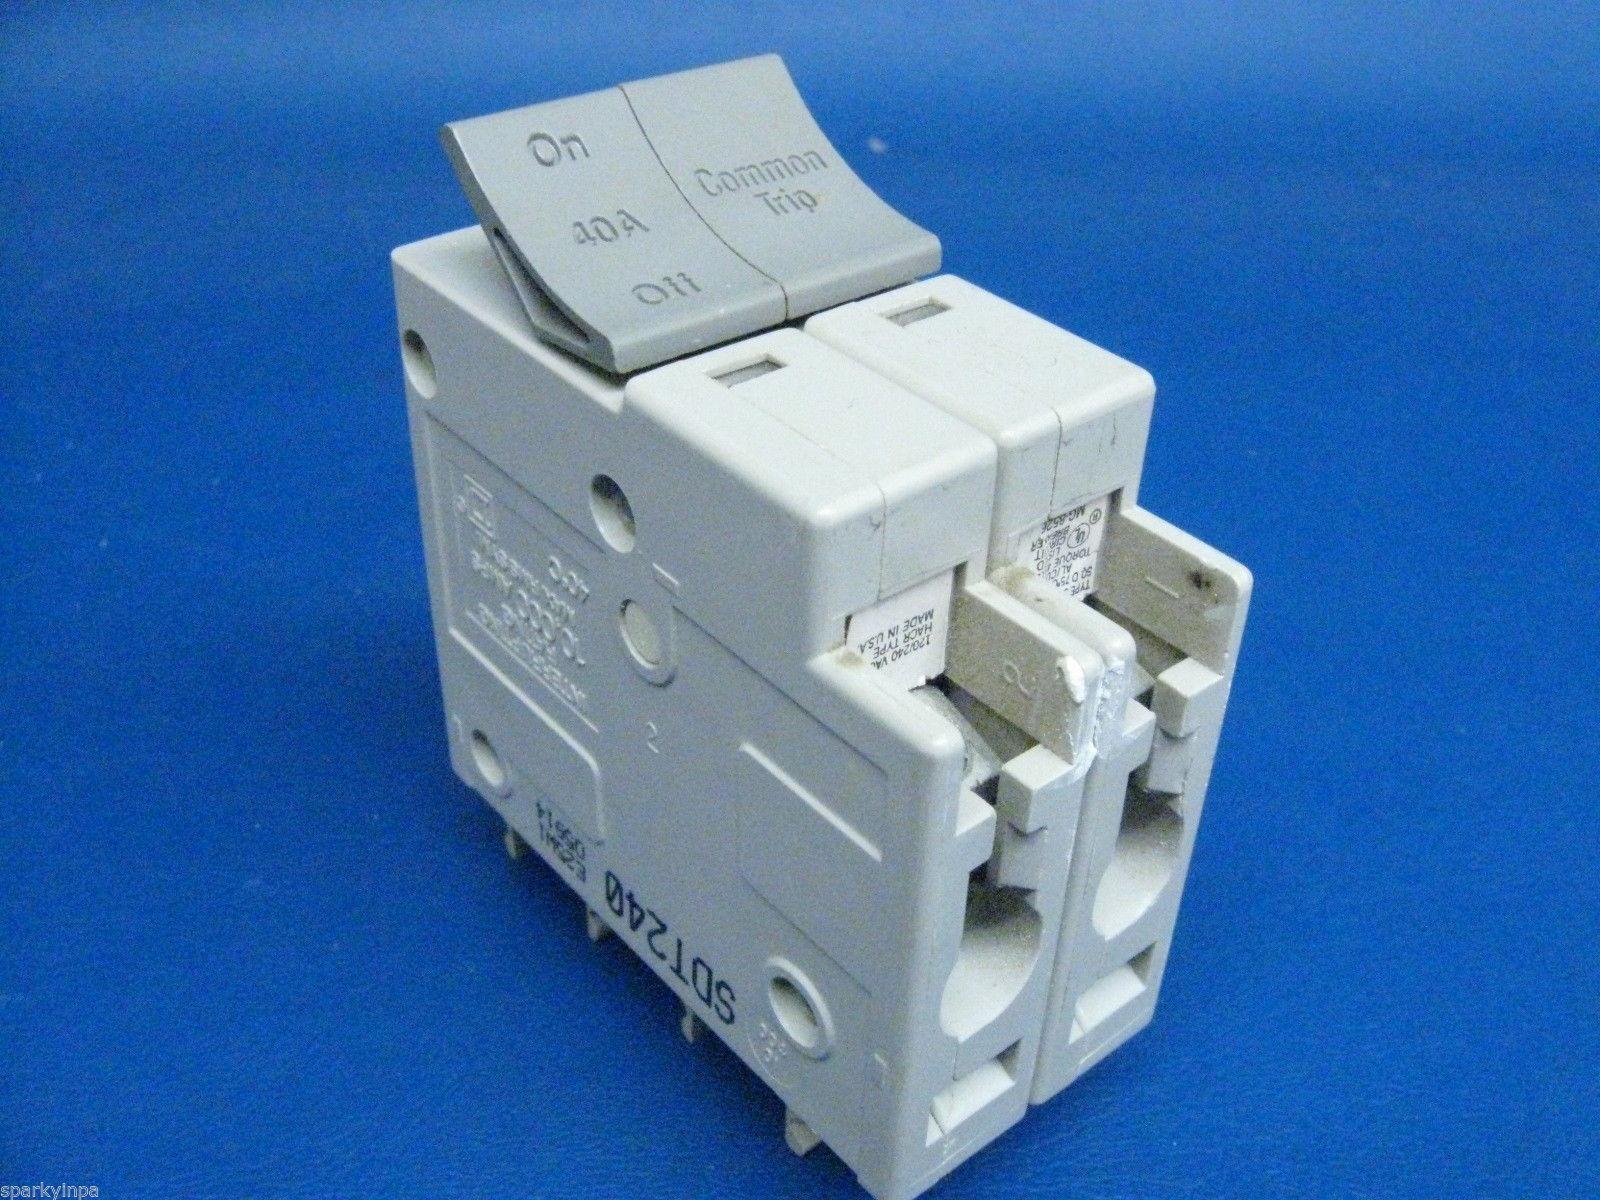 40 Amp Square D TRILLIANT 40A SQD Breaker Double or 2 Pole SDT240  GUARANTEED !